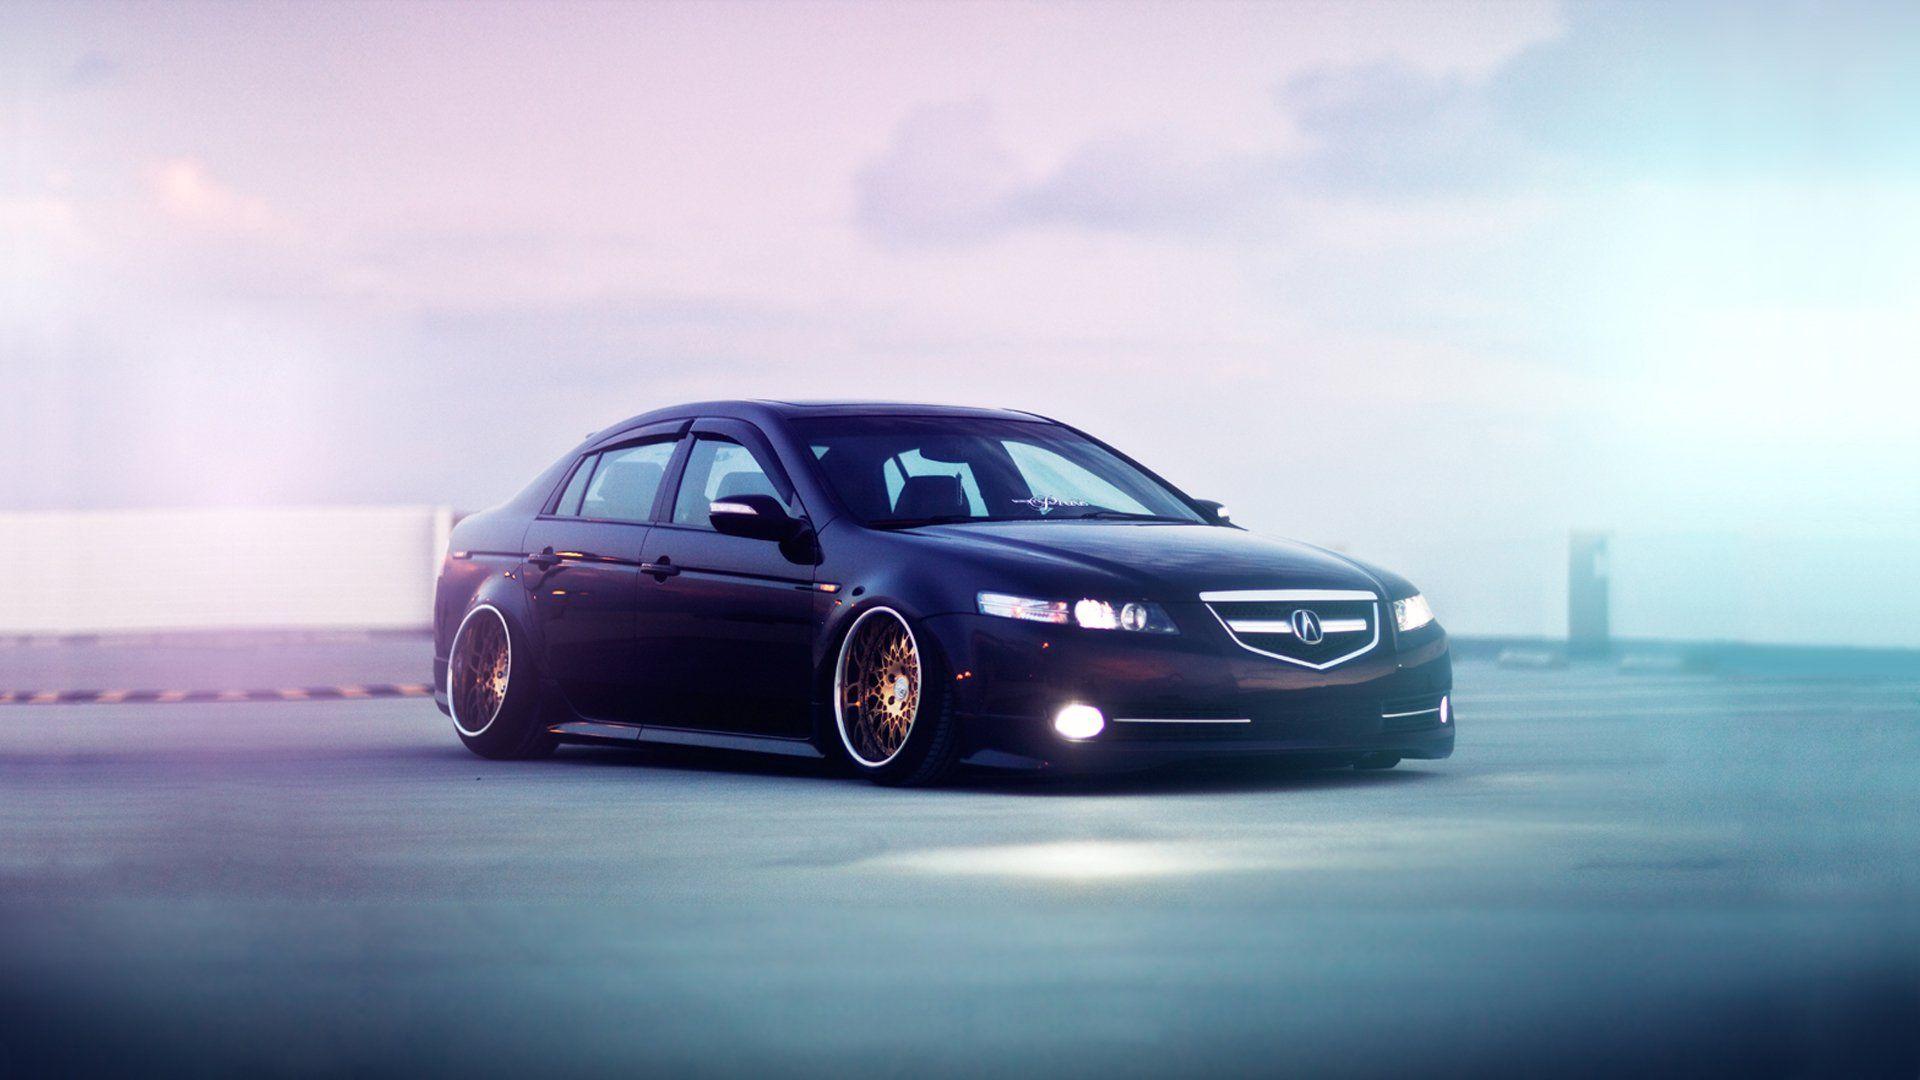 Honda Accord jpg